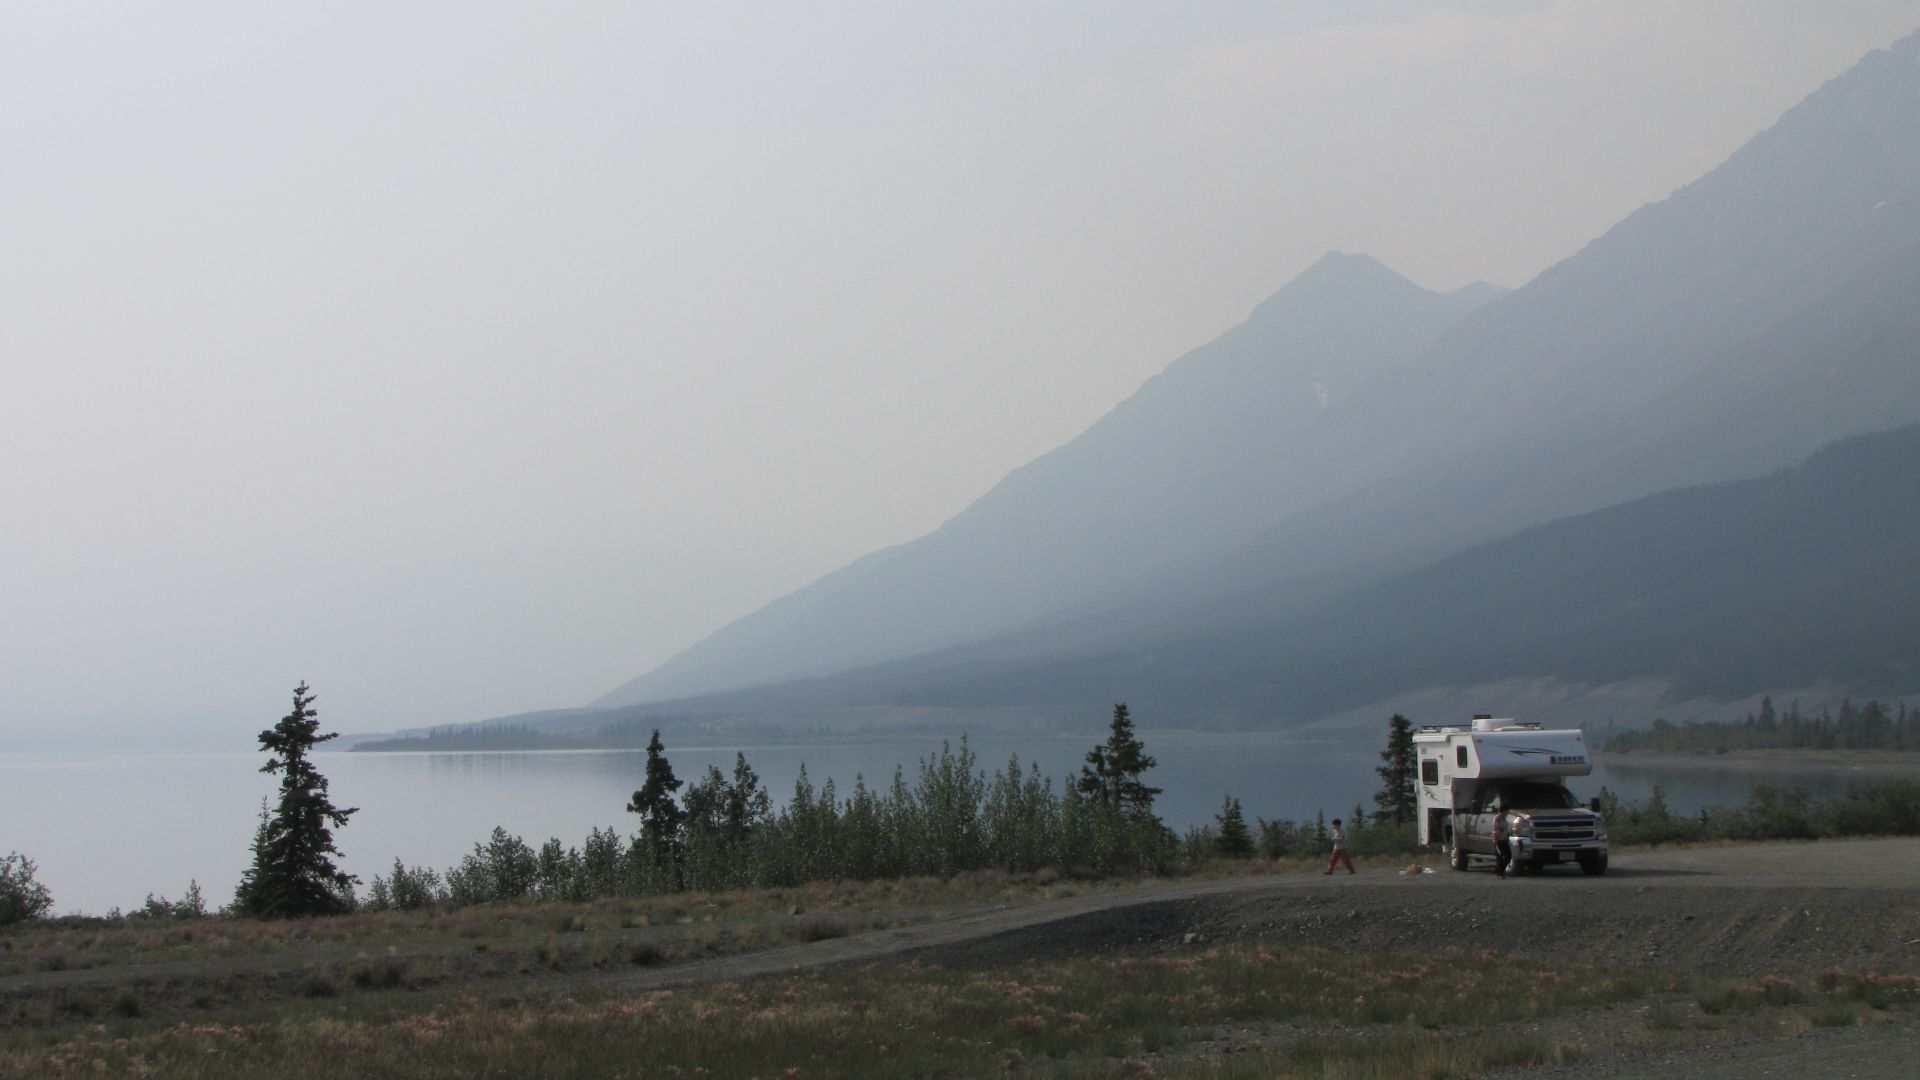 Kluane Lake, YT, Canada - RV, biker & cyclists heaven